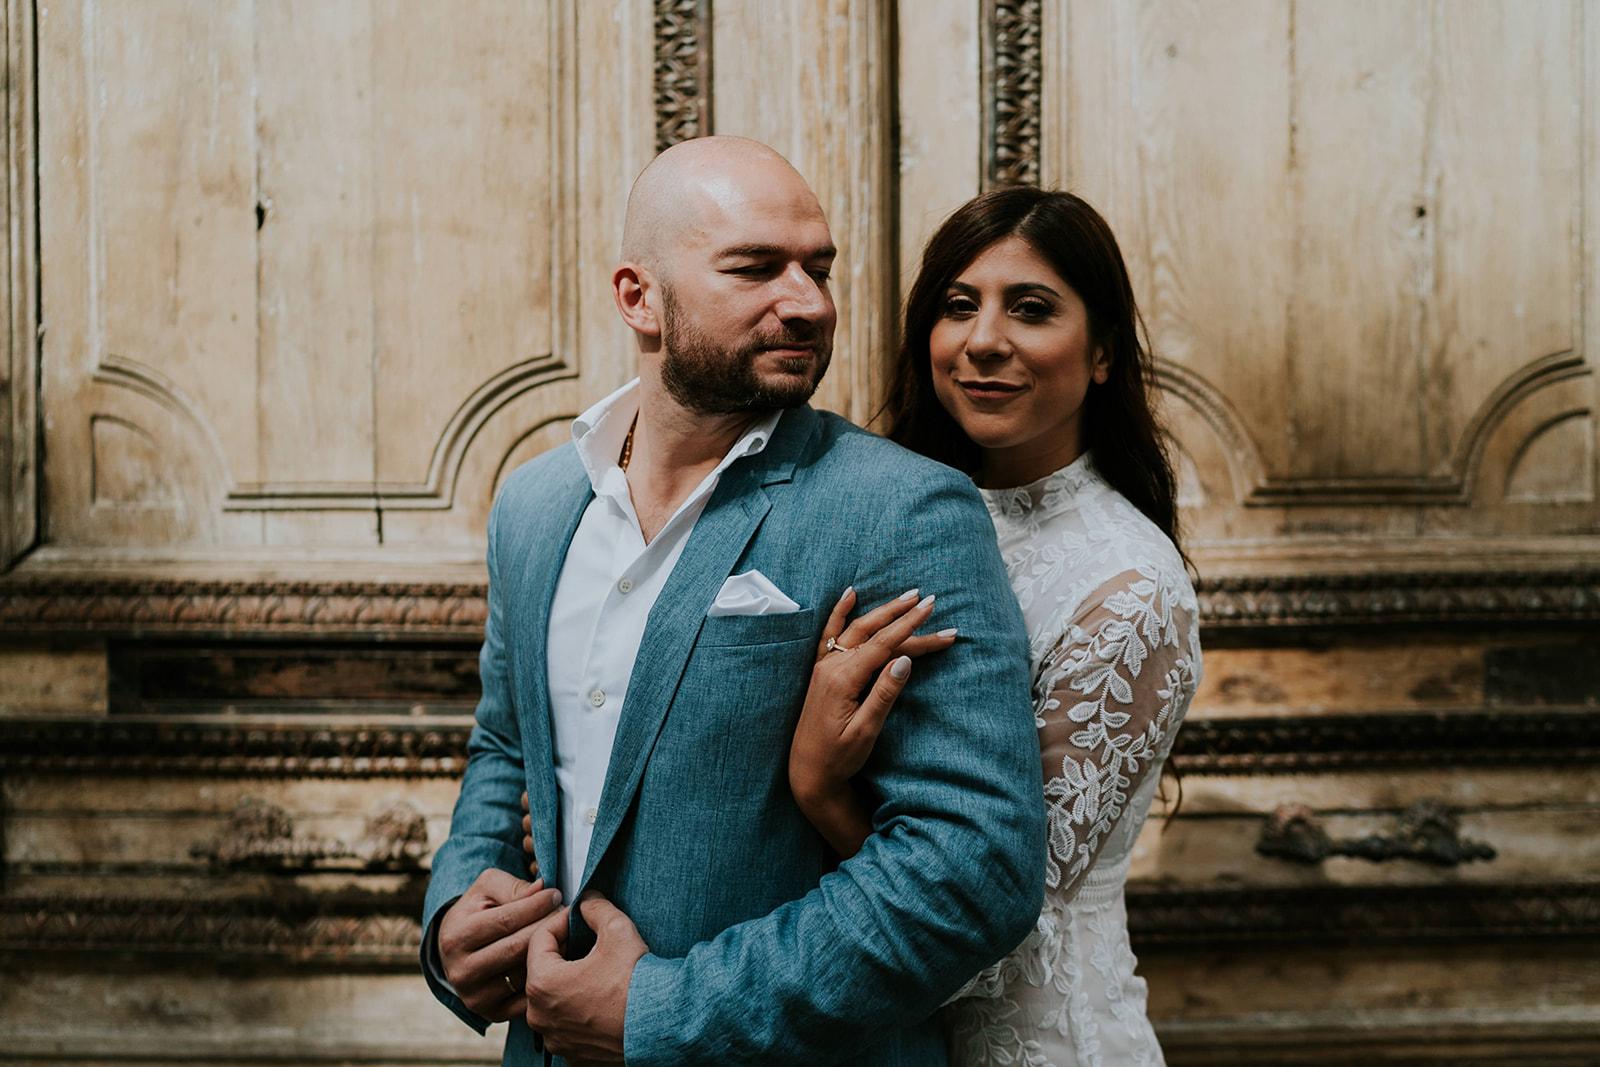 Sabri-photographe-sayde-_-george-wedding-9.jpg